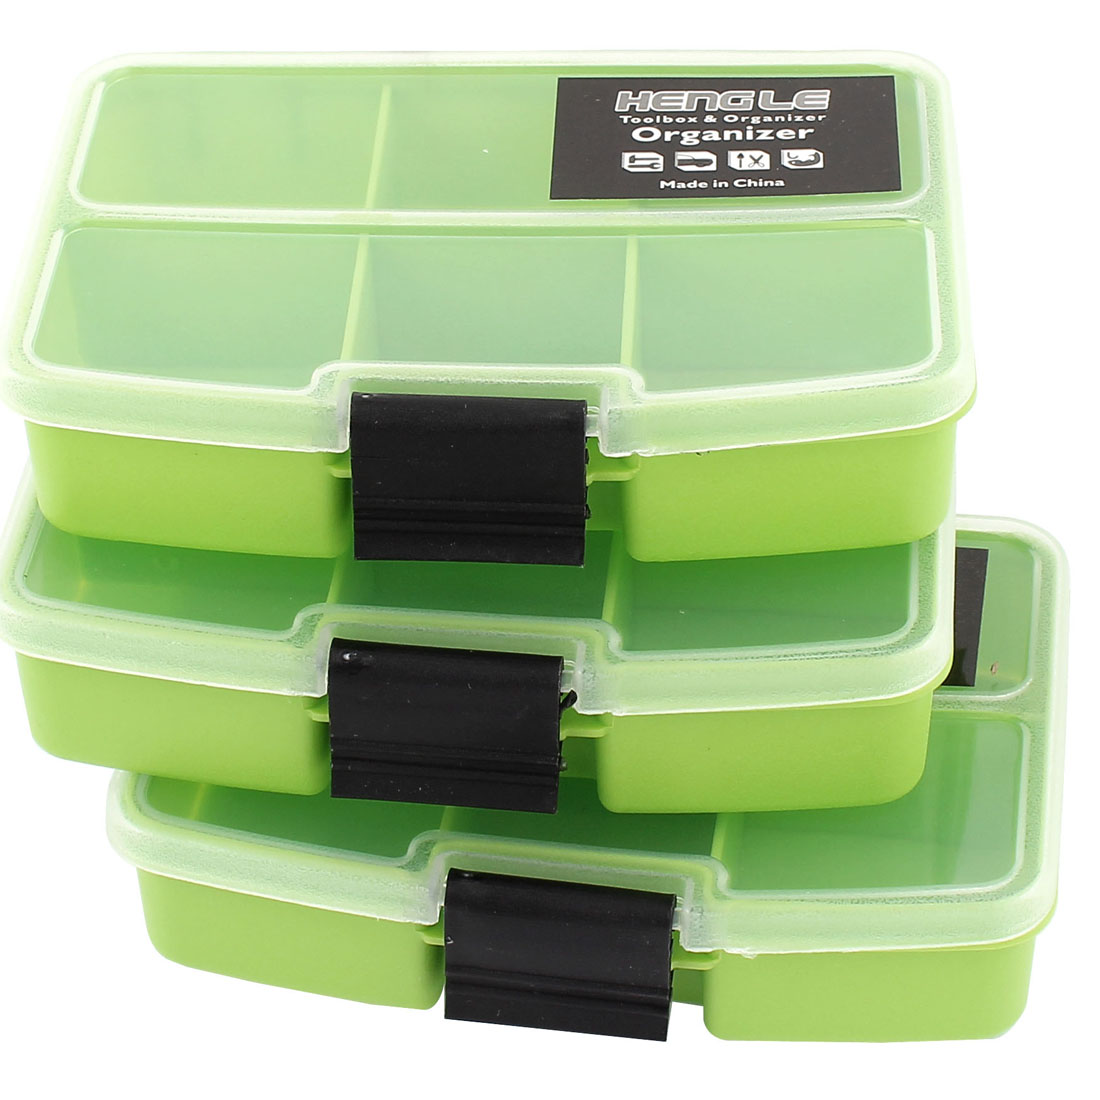 Green Crafts Jewellery Holder Organizer Storage Box Case 6 Compartments 3 Pcs